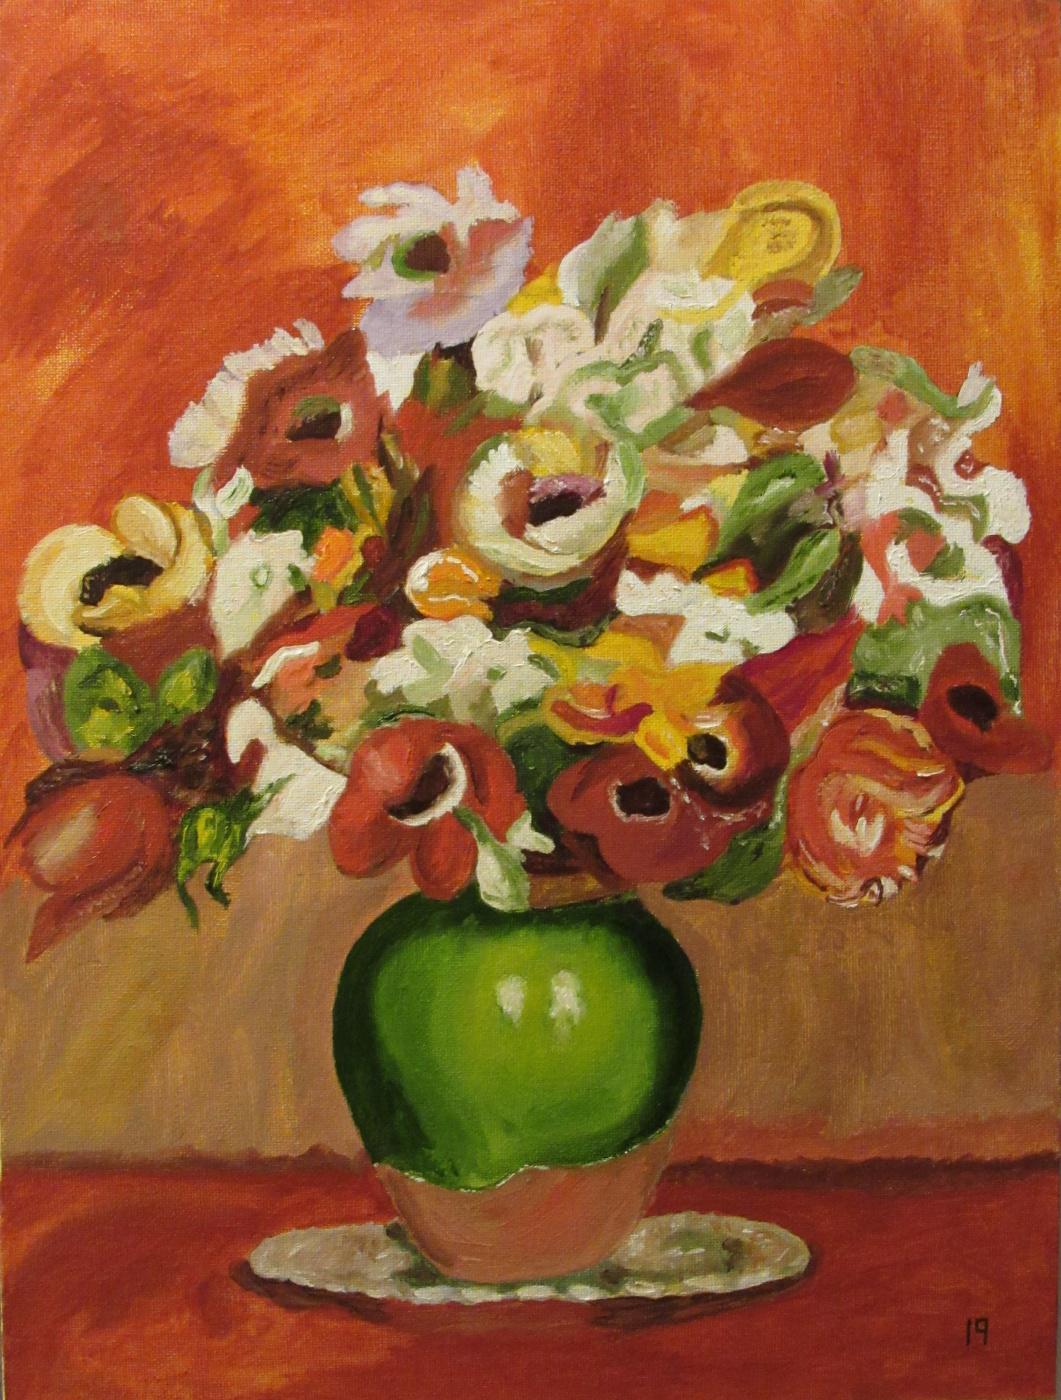 Artashes Vladimirovich Badalyan. Renoir. Flowers - x-hardboard-m - 40x30